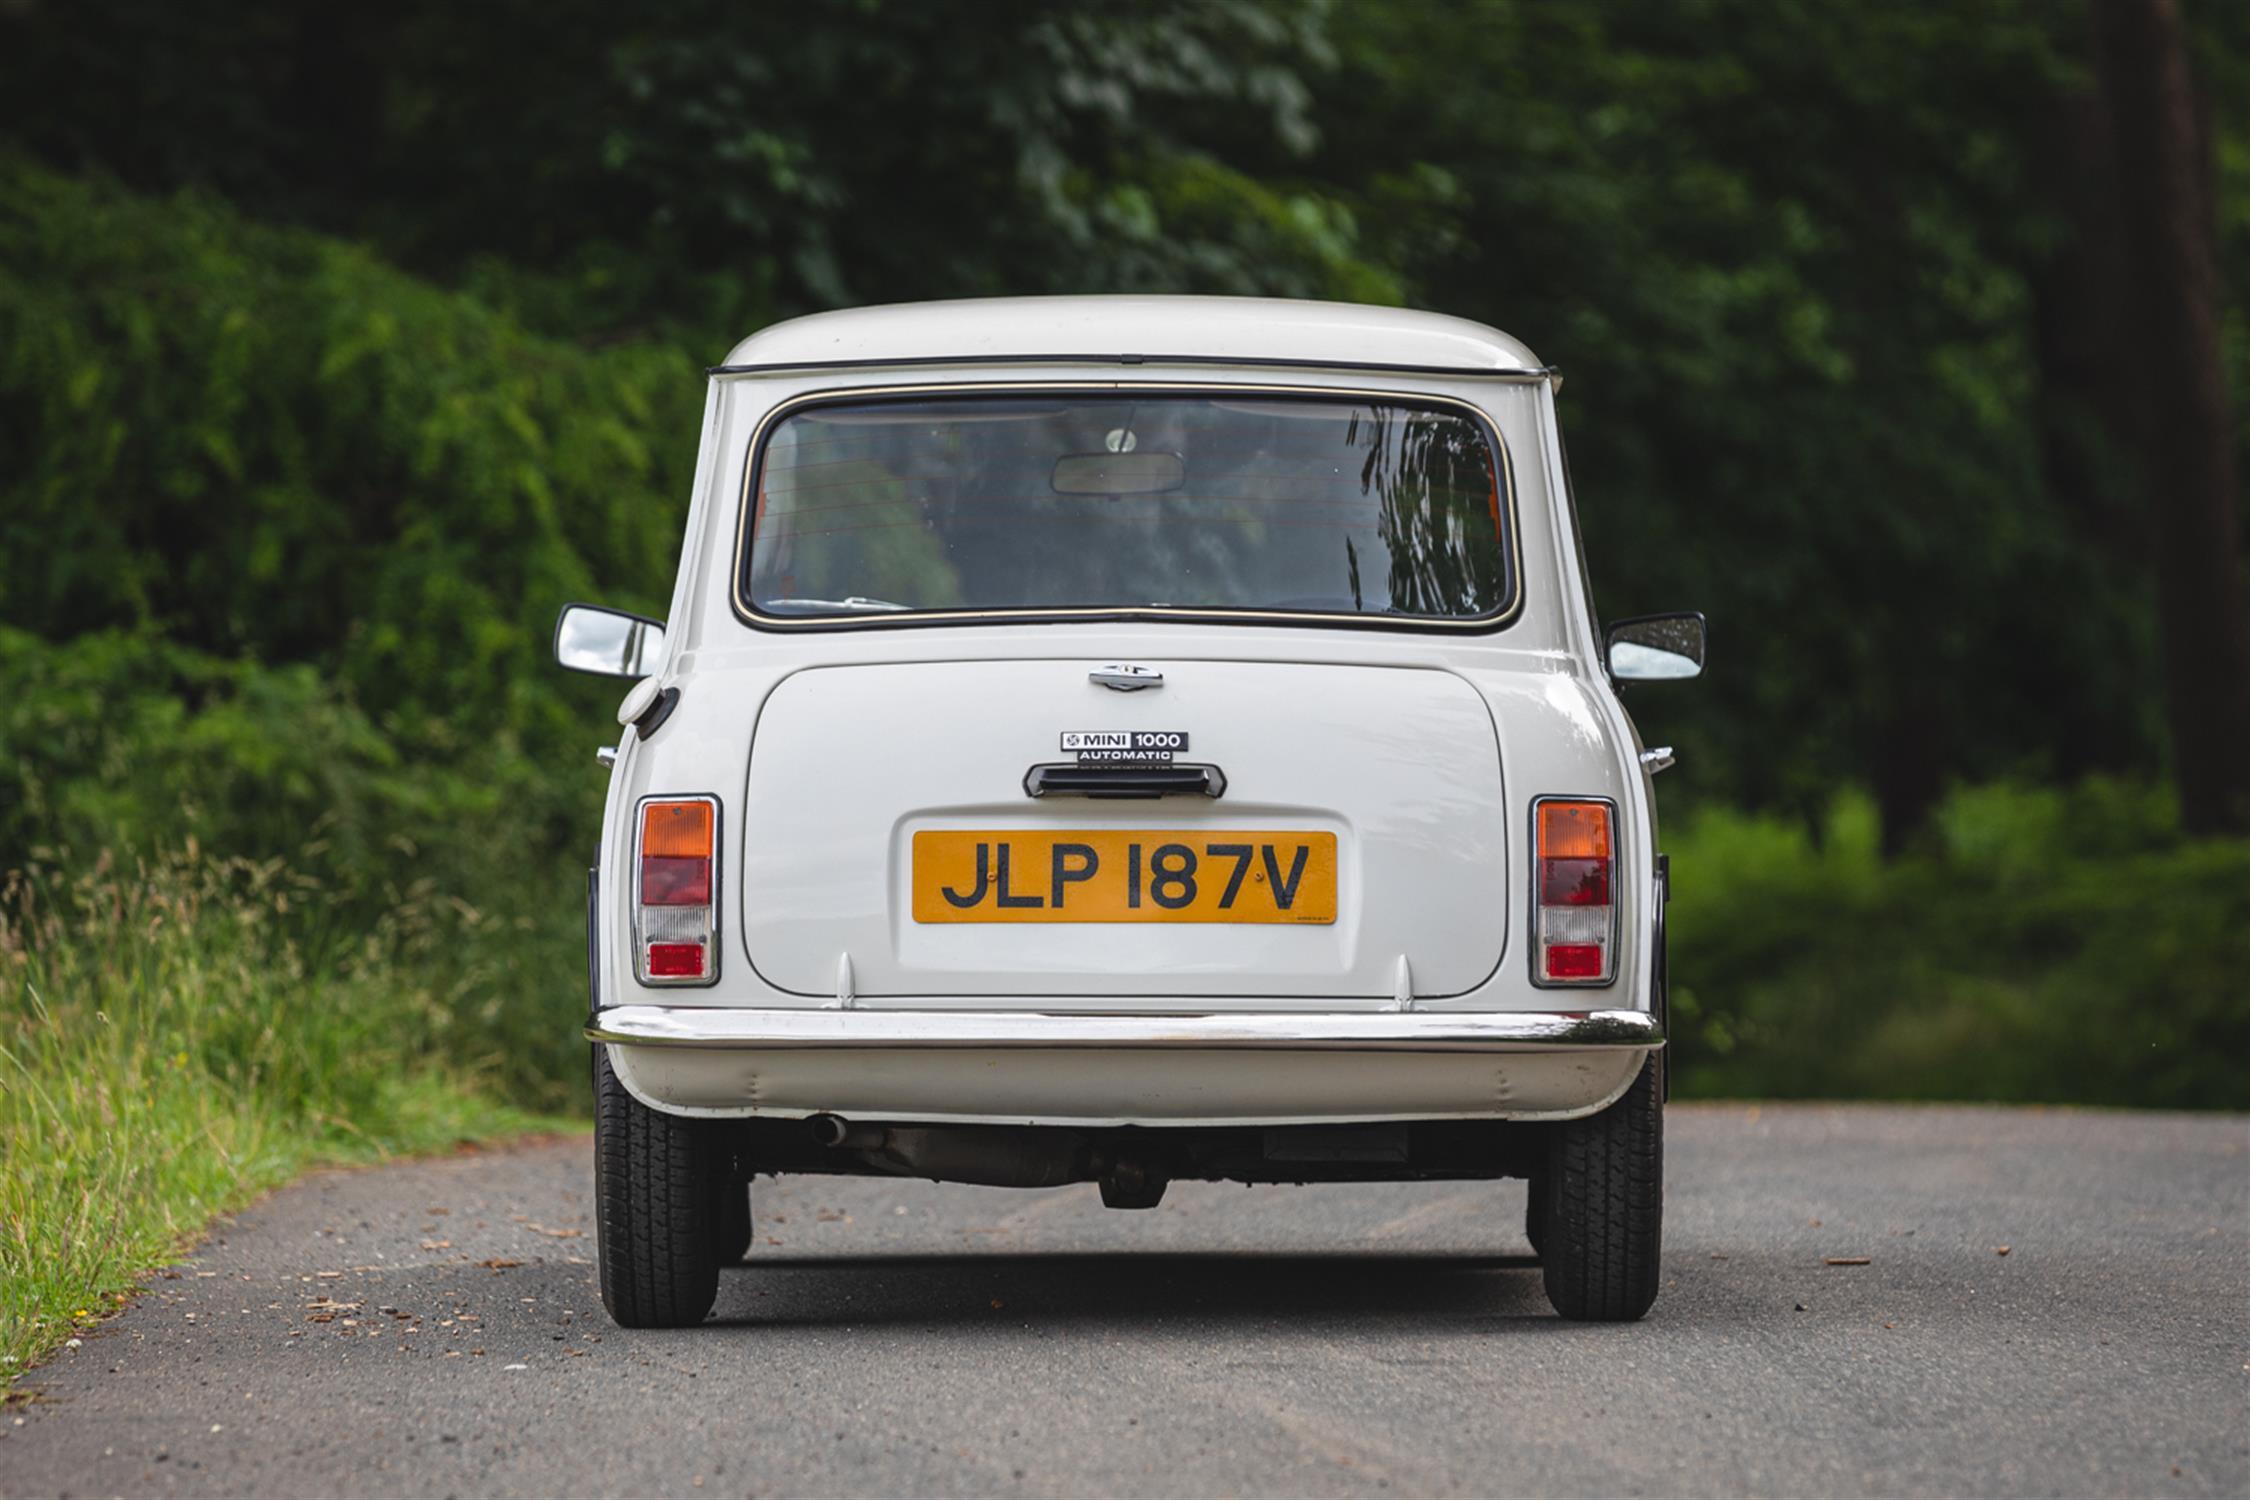 1979 Austin Mini 1000 (Auto) - 2,699 Miles - Image 7 of 10